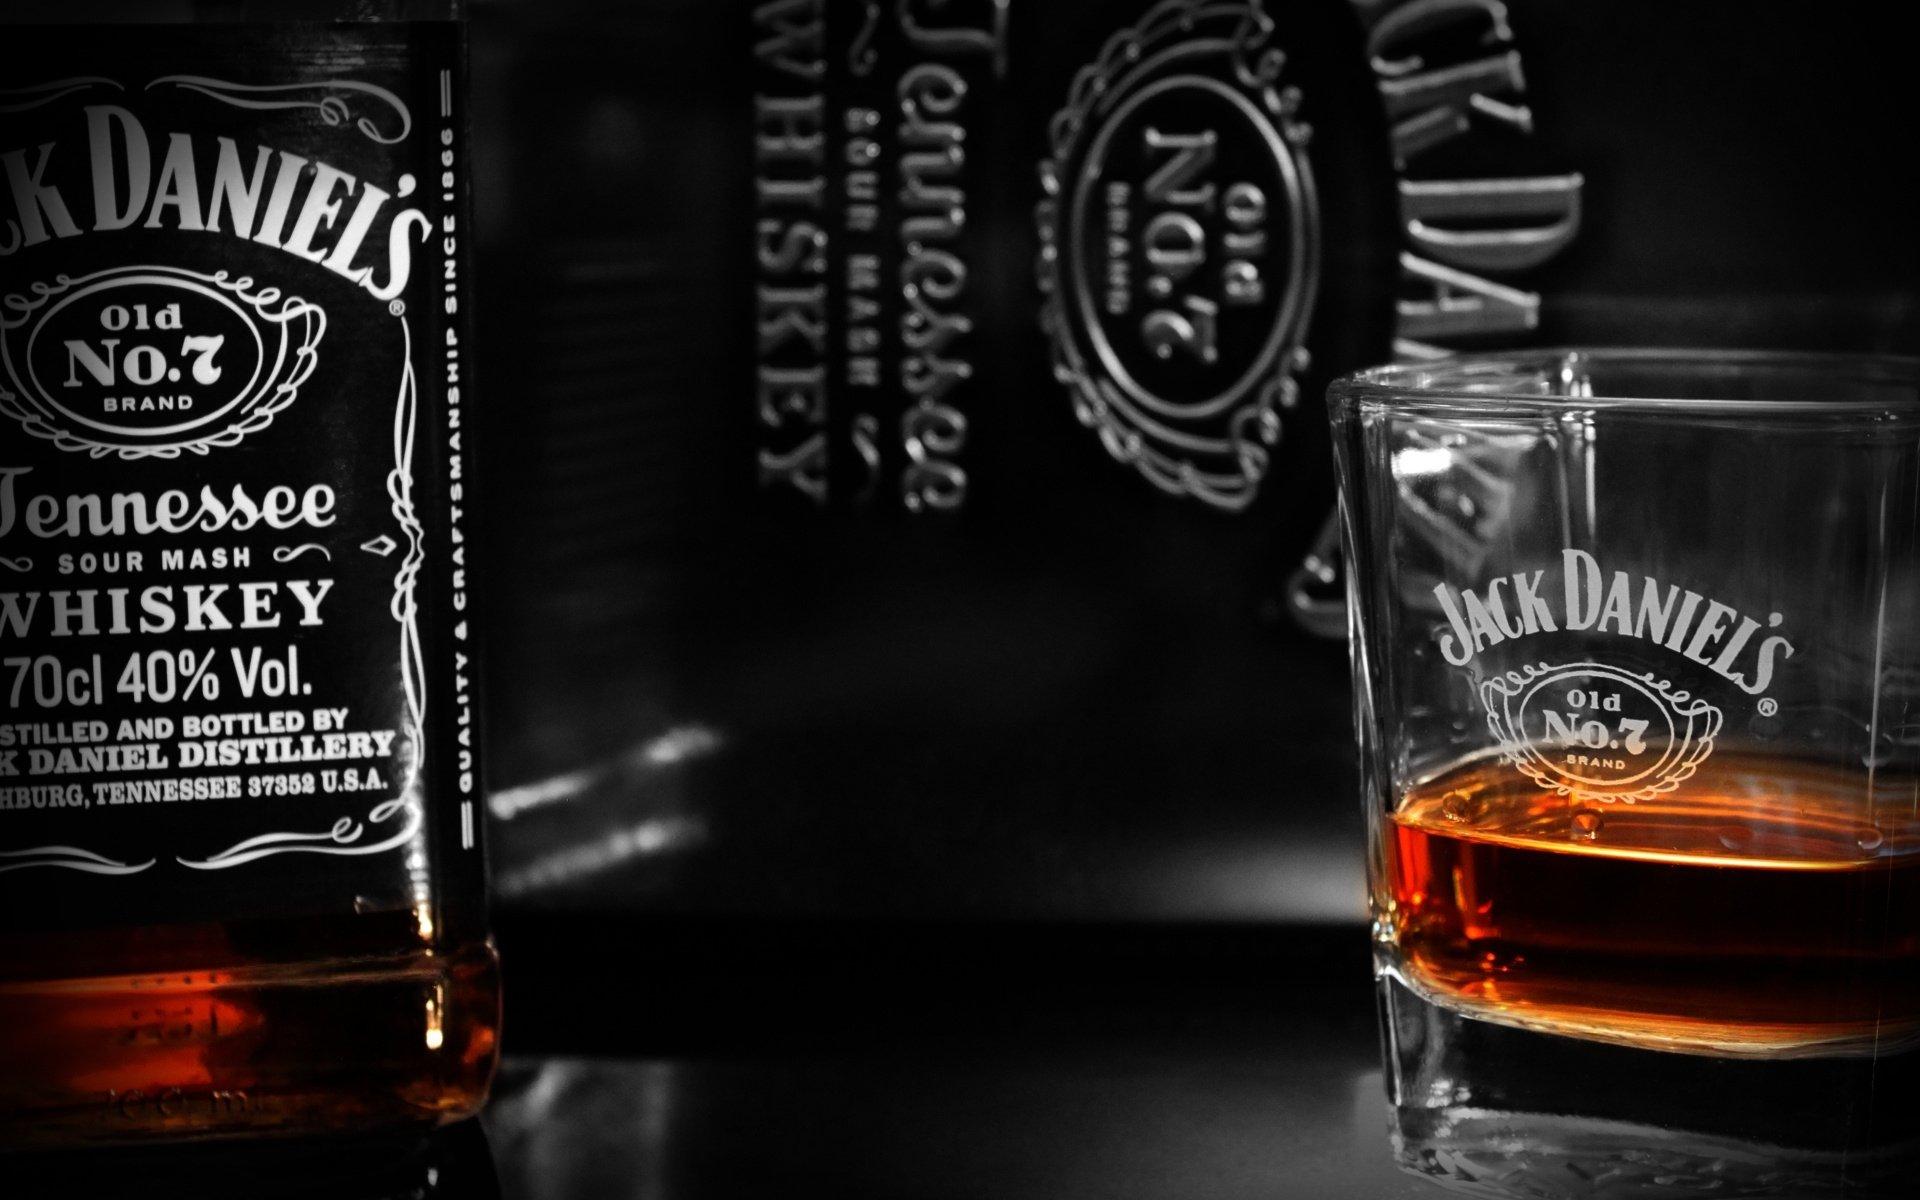 foto de Jack Daniels HD Wallpaper Background Image 1920x1200 ID:400655 Wallpaper Abyss